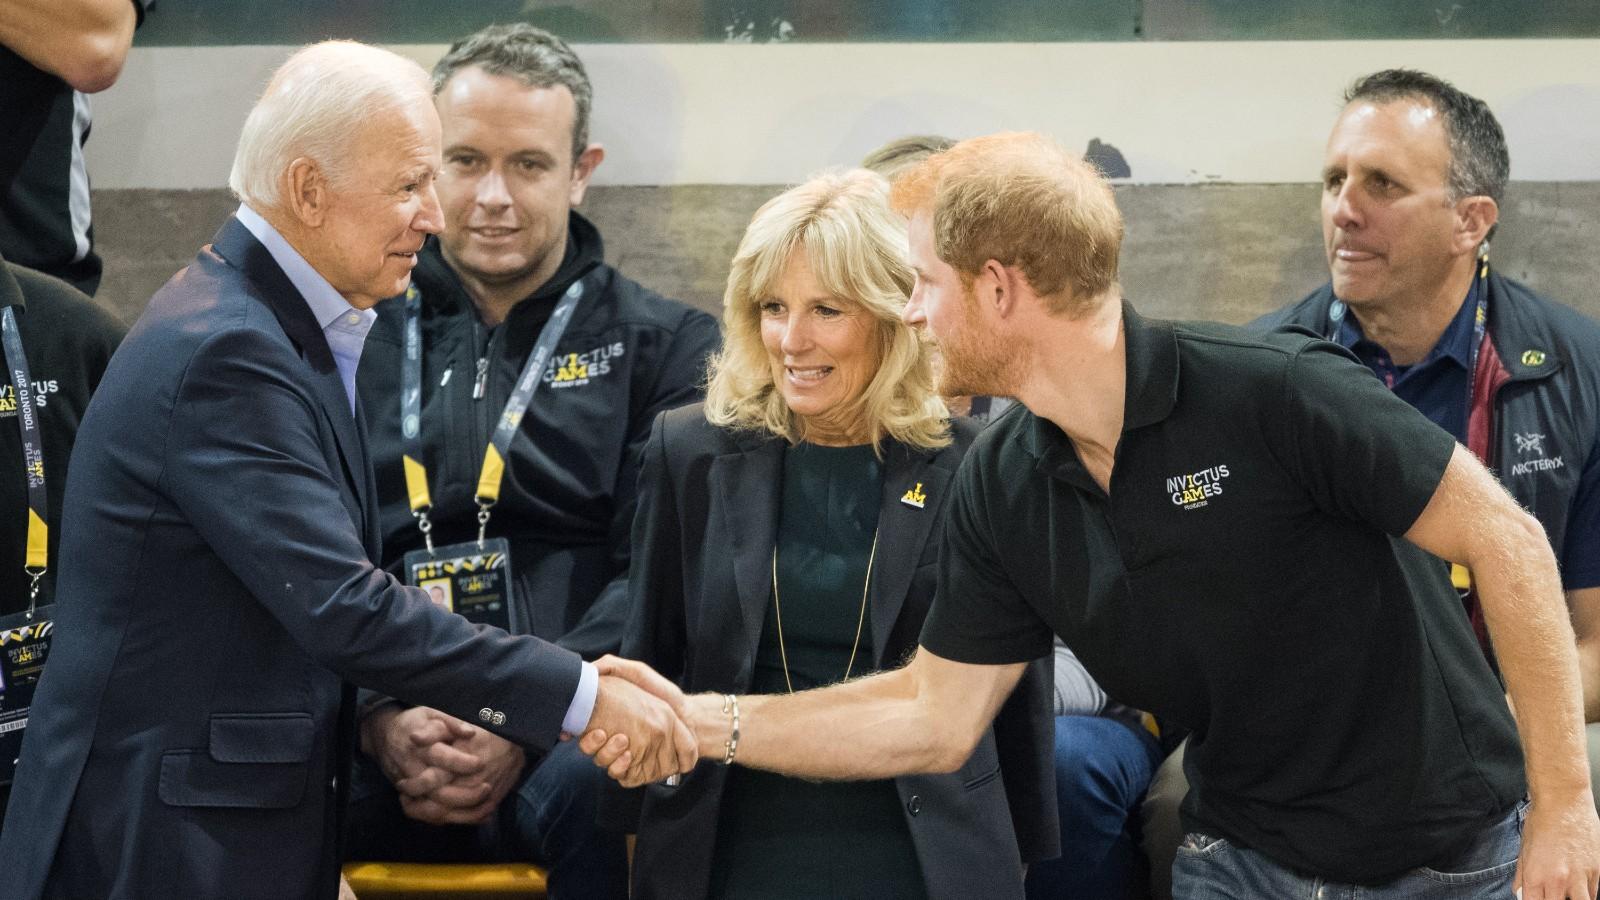 Joe Biden serrant la main du Prince Harry aux côtés de Jill Biden.